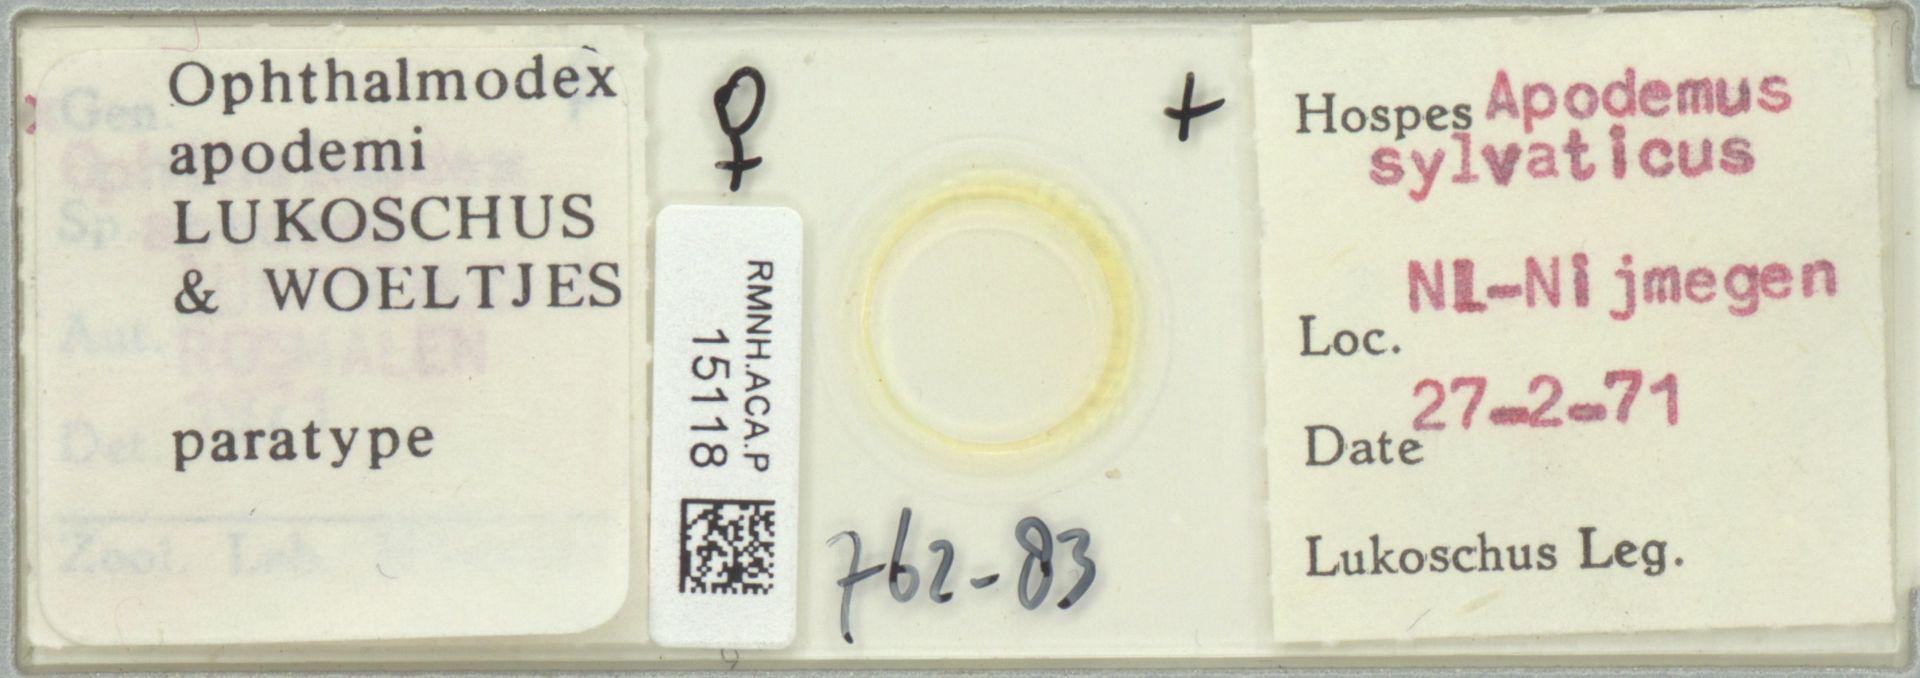 RMNH.ACA.P.15118 | Ophthalmodex apodemi Lukoschus & Woeltjes